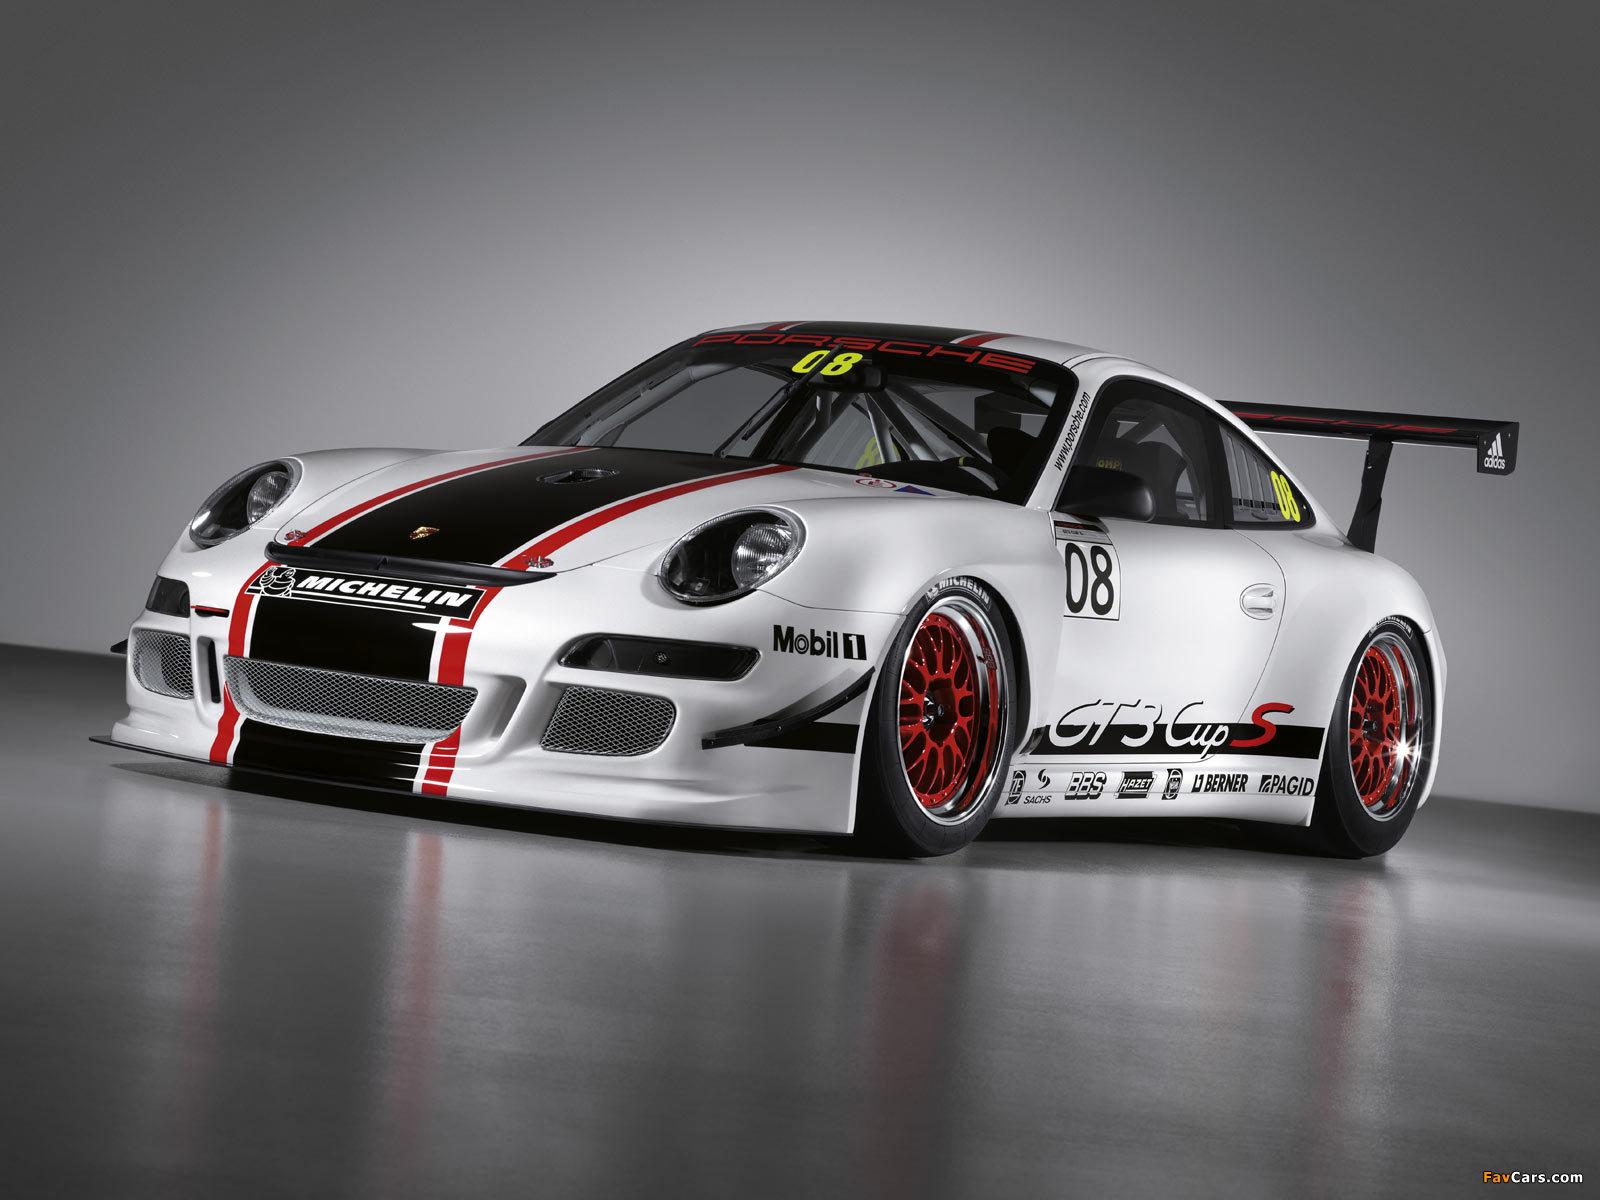 Porsche 911 Gt3 Cup S 997 2008 Wallpapers 1600x1200